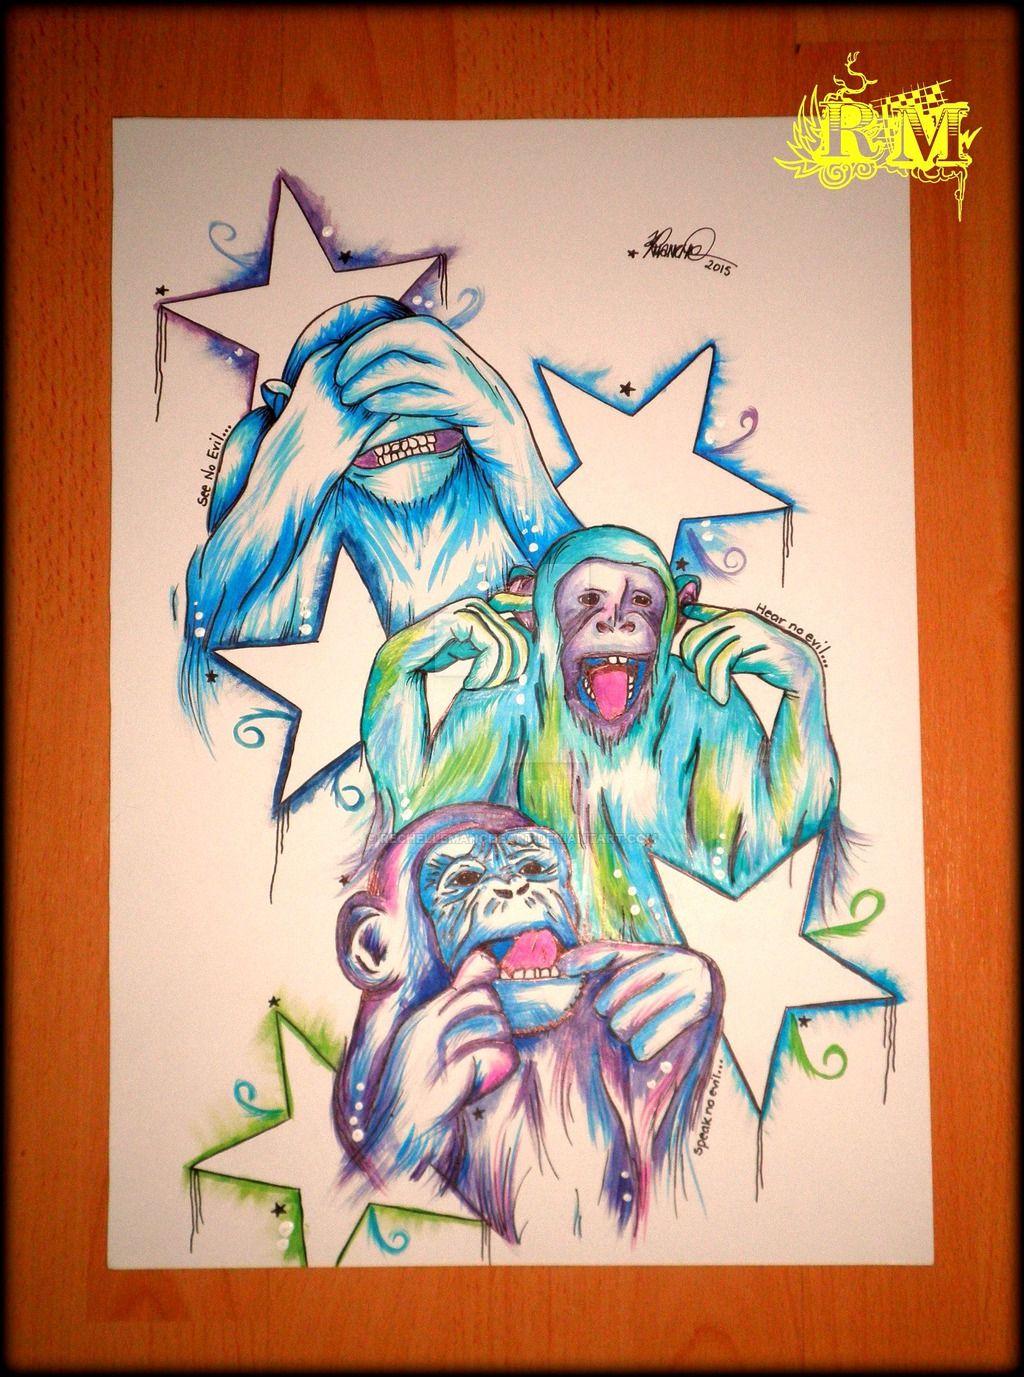 7aed18000 see no evil, hear no evil, speak no evil by RechelleMancheART.deviantart.com  on @DeviantArt #inspiration #quotes #art #artist #monkey #threewisemonkeys  # ...